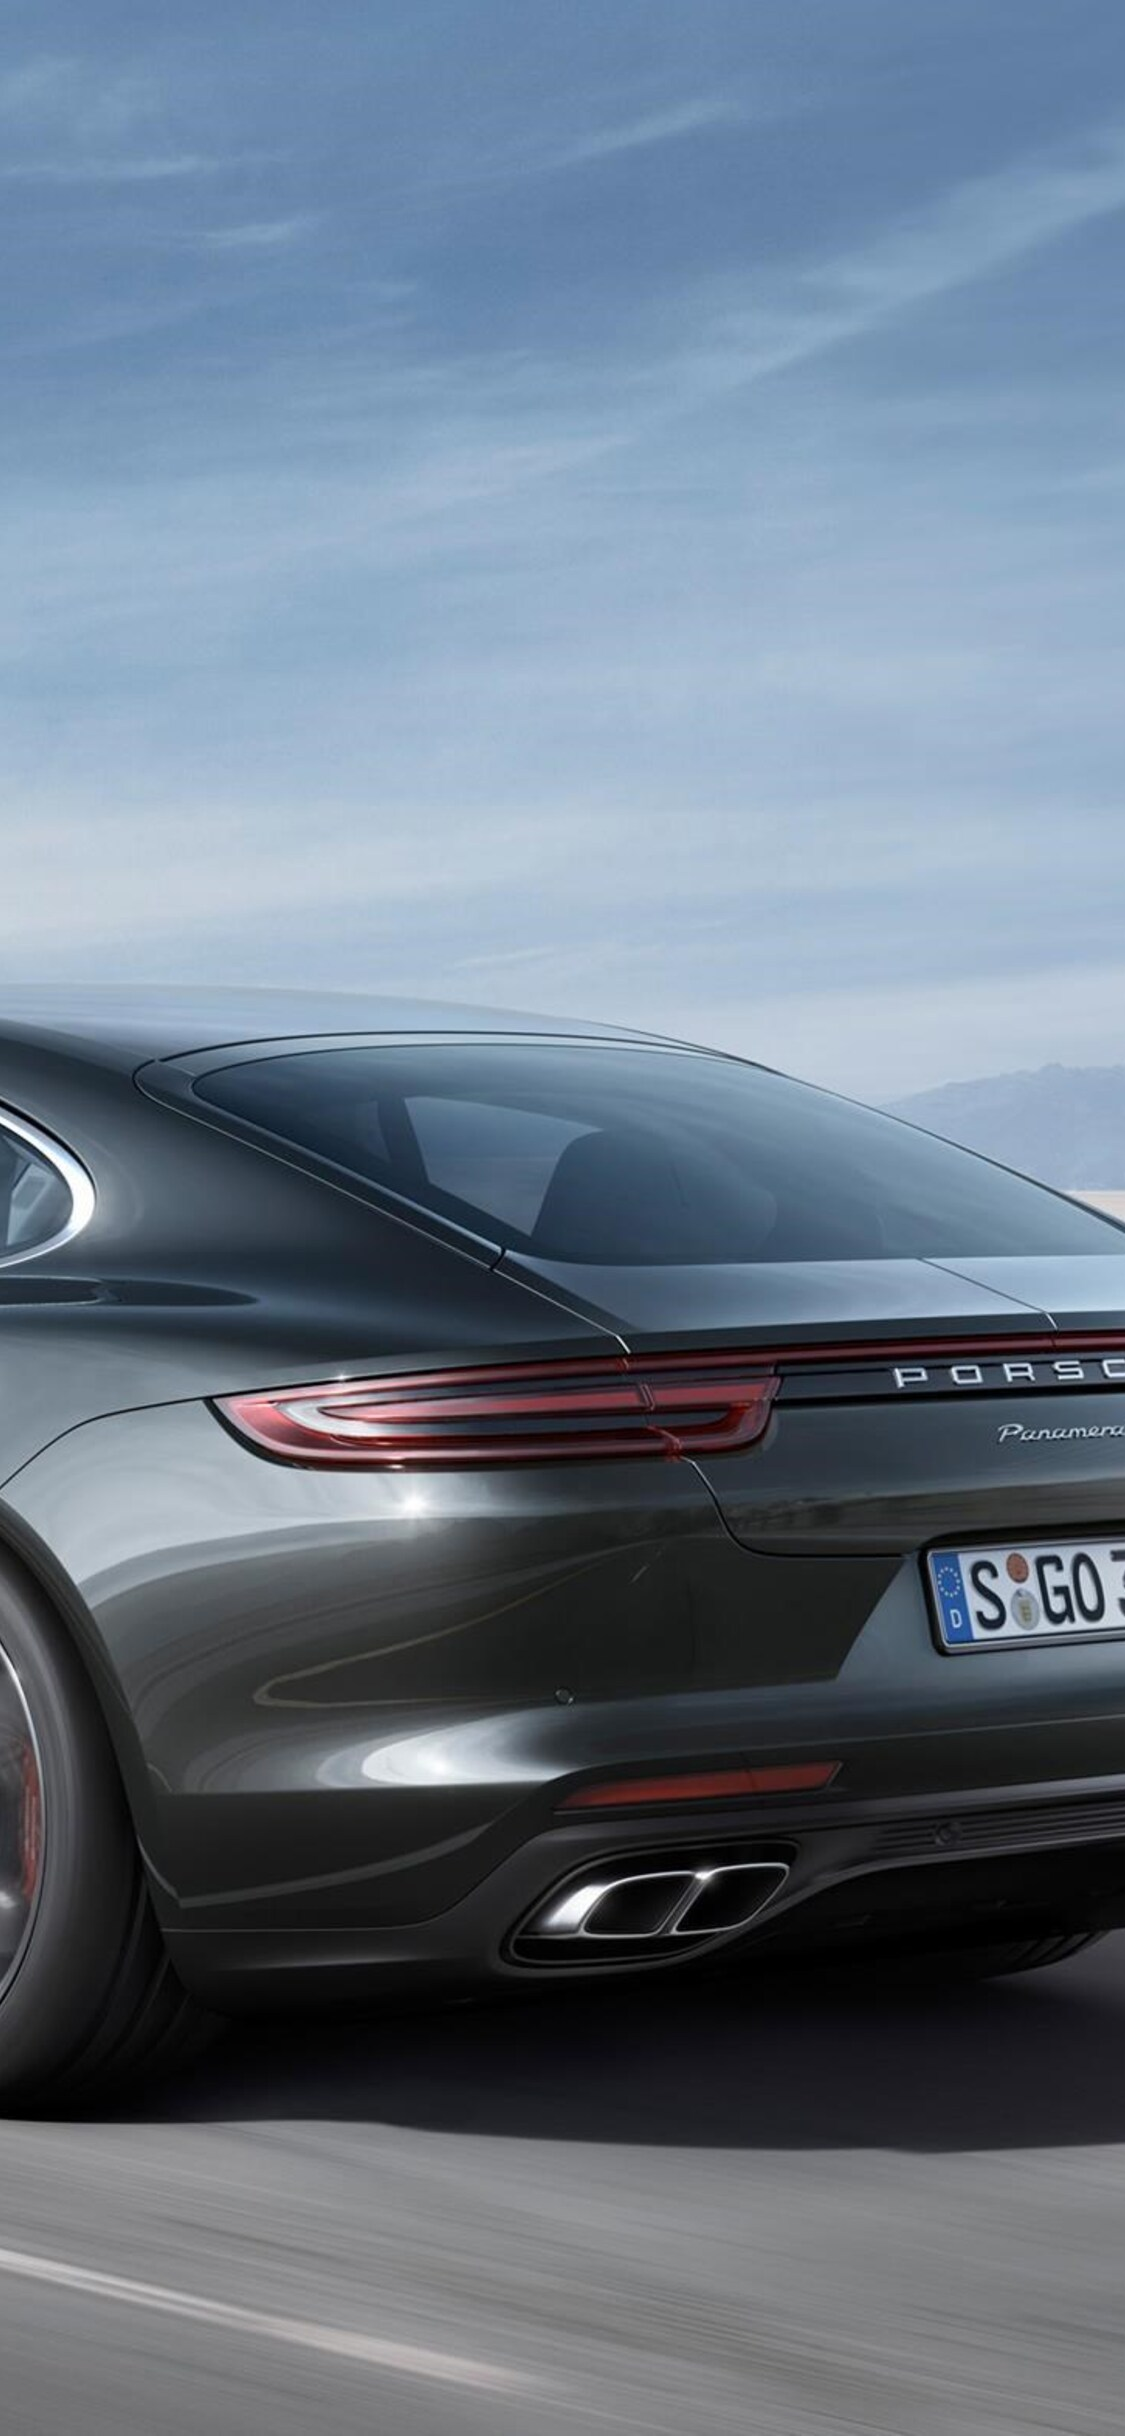 1125x2436 Porsche Panamera Turbo Hd Iphone Xs Iphone 10 Iphone X Hd